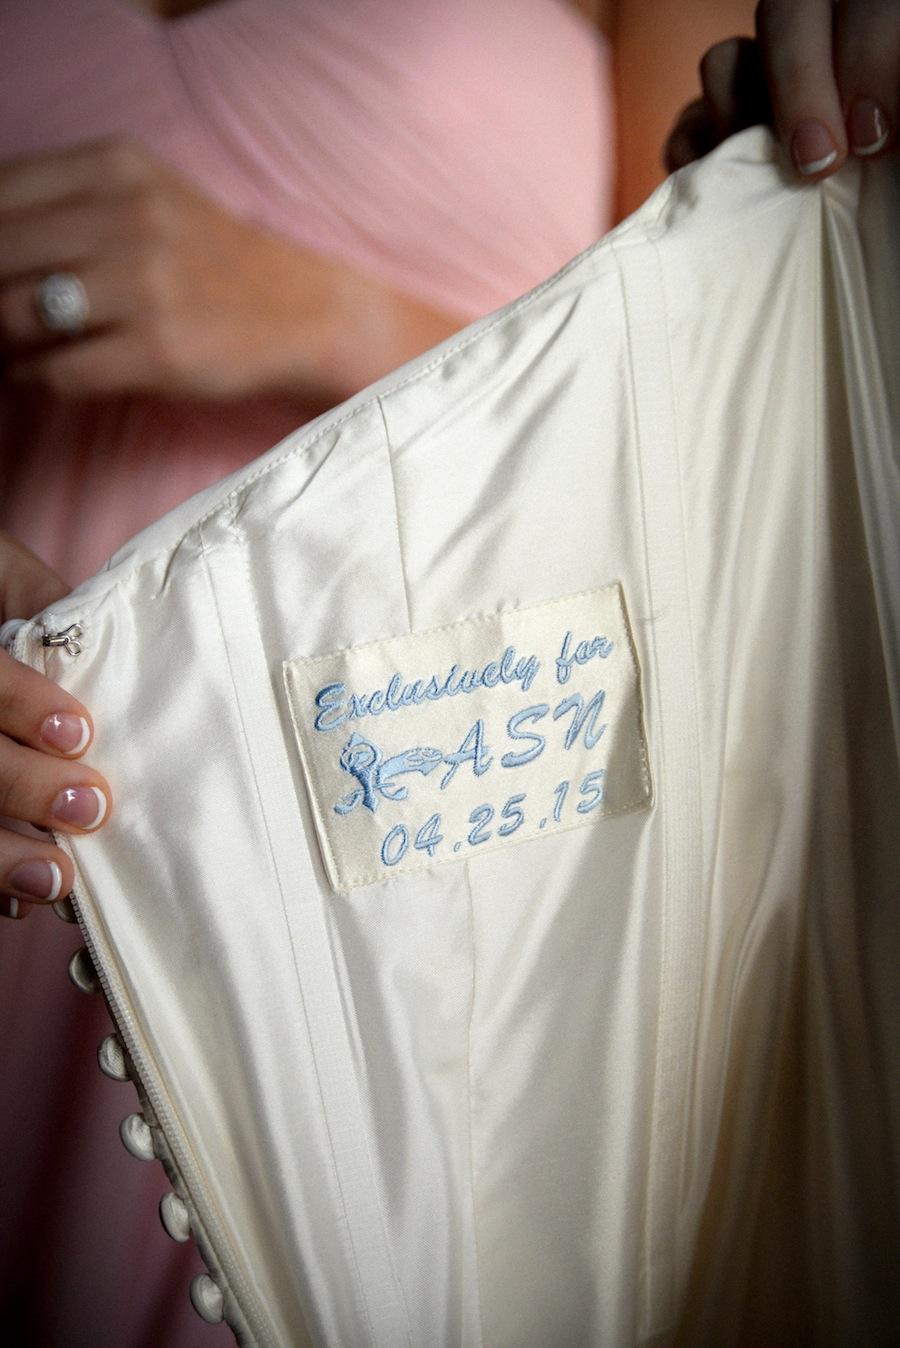 Wedding Dress Patch Sewn Inside Gown | Getting Ready Wedding Day Details